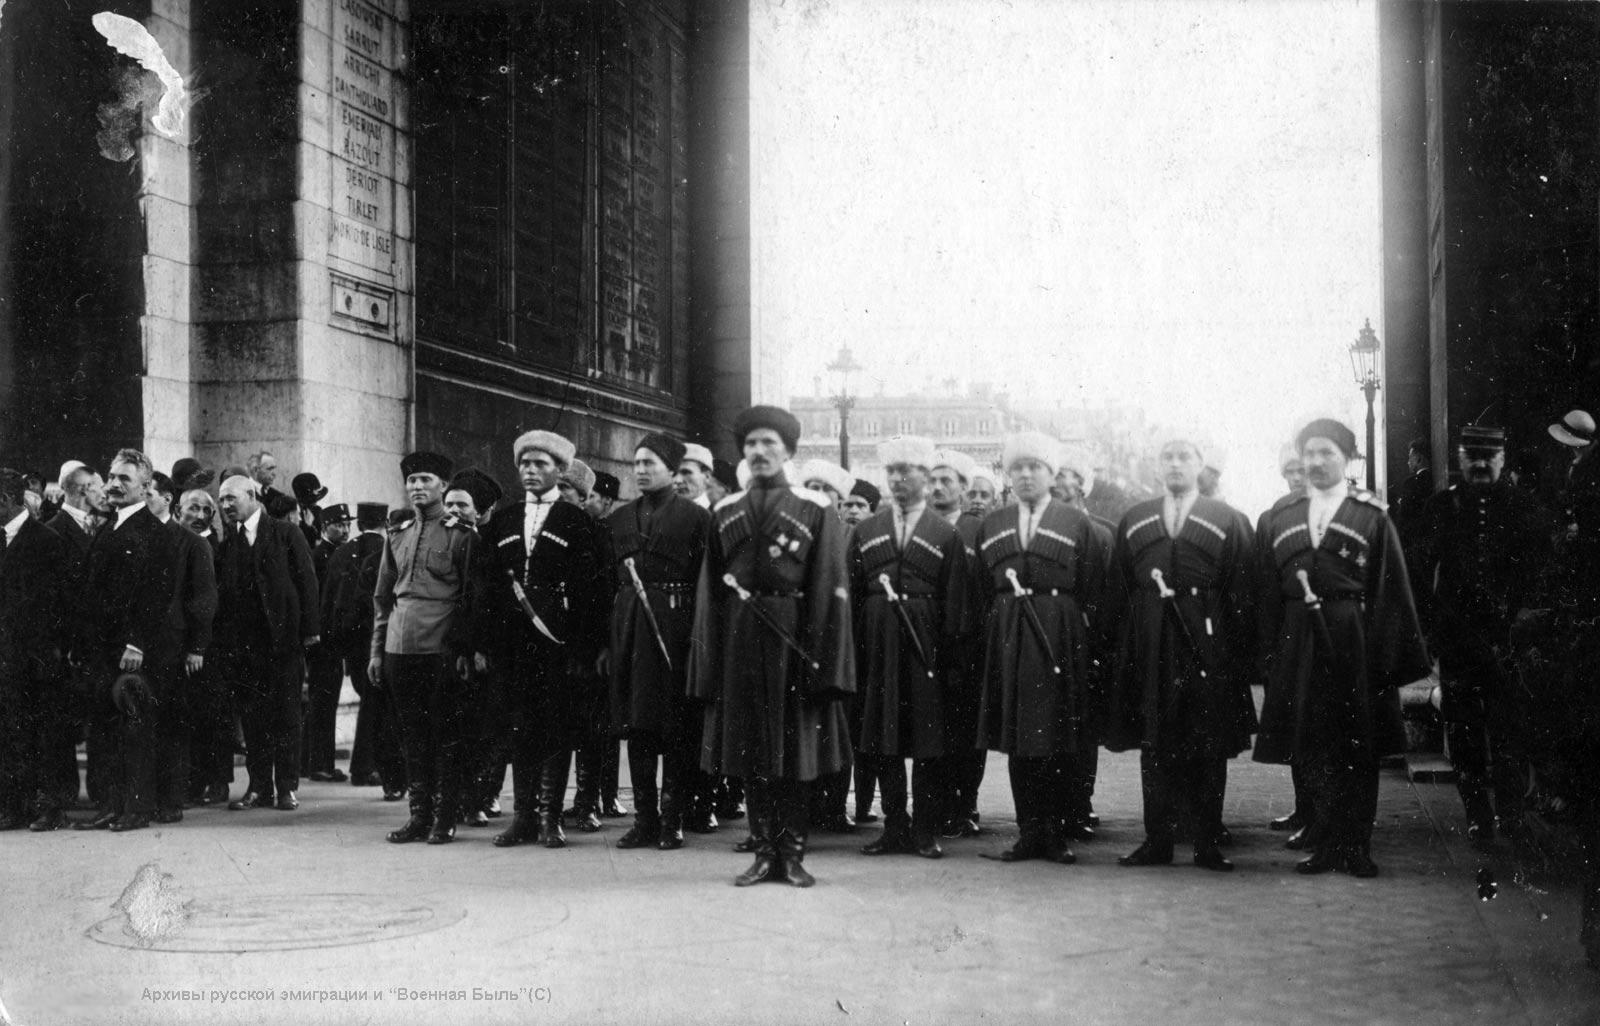 Триумфальная Арка в Париже и могила неизвестного солдата